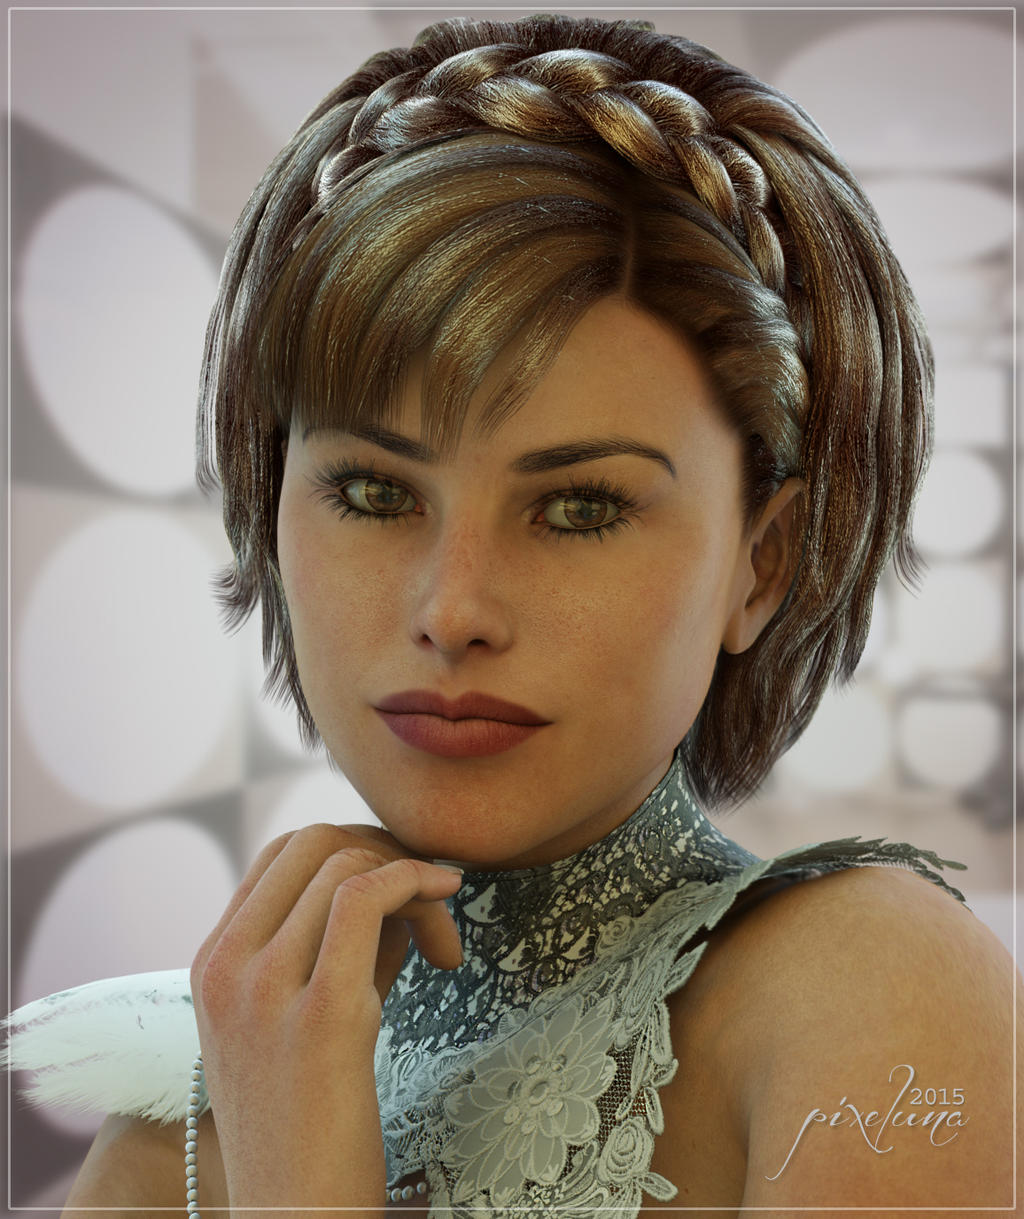 Lavinia by pixeluna